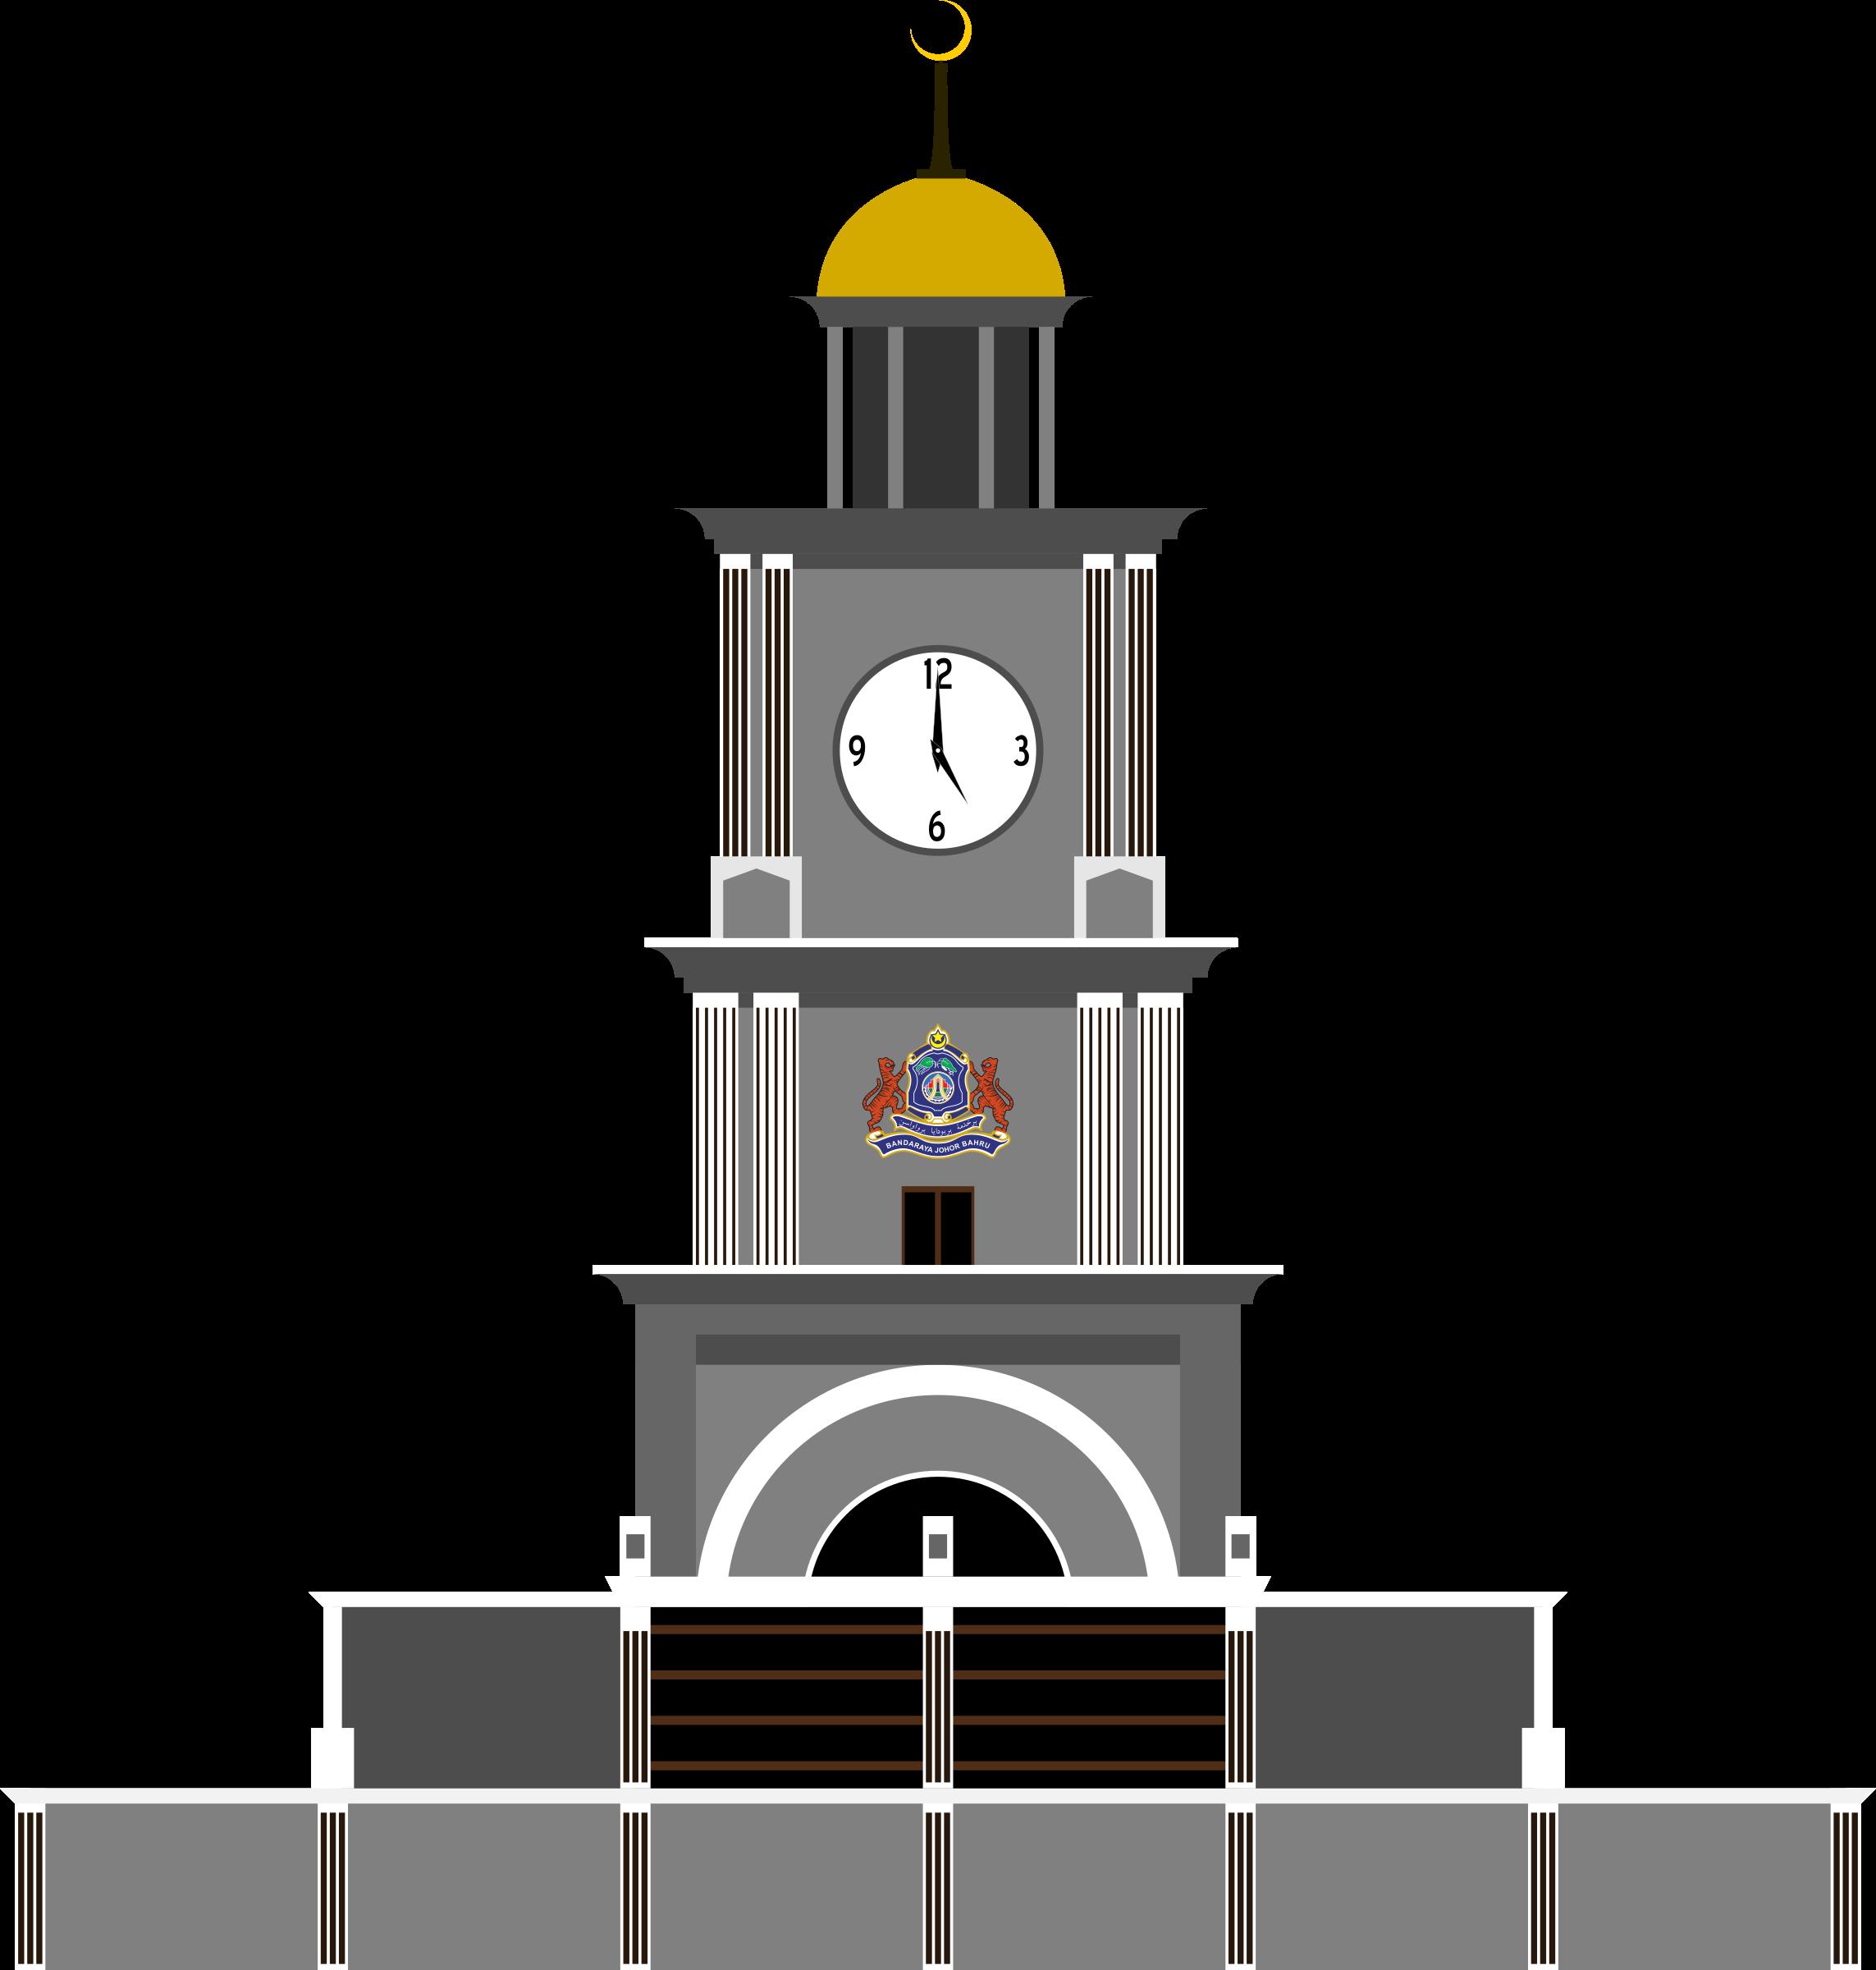 Clock Tower, Johor Bahru by derkommander0916